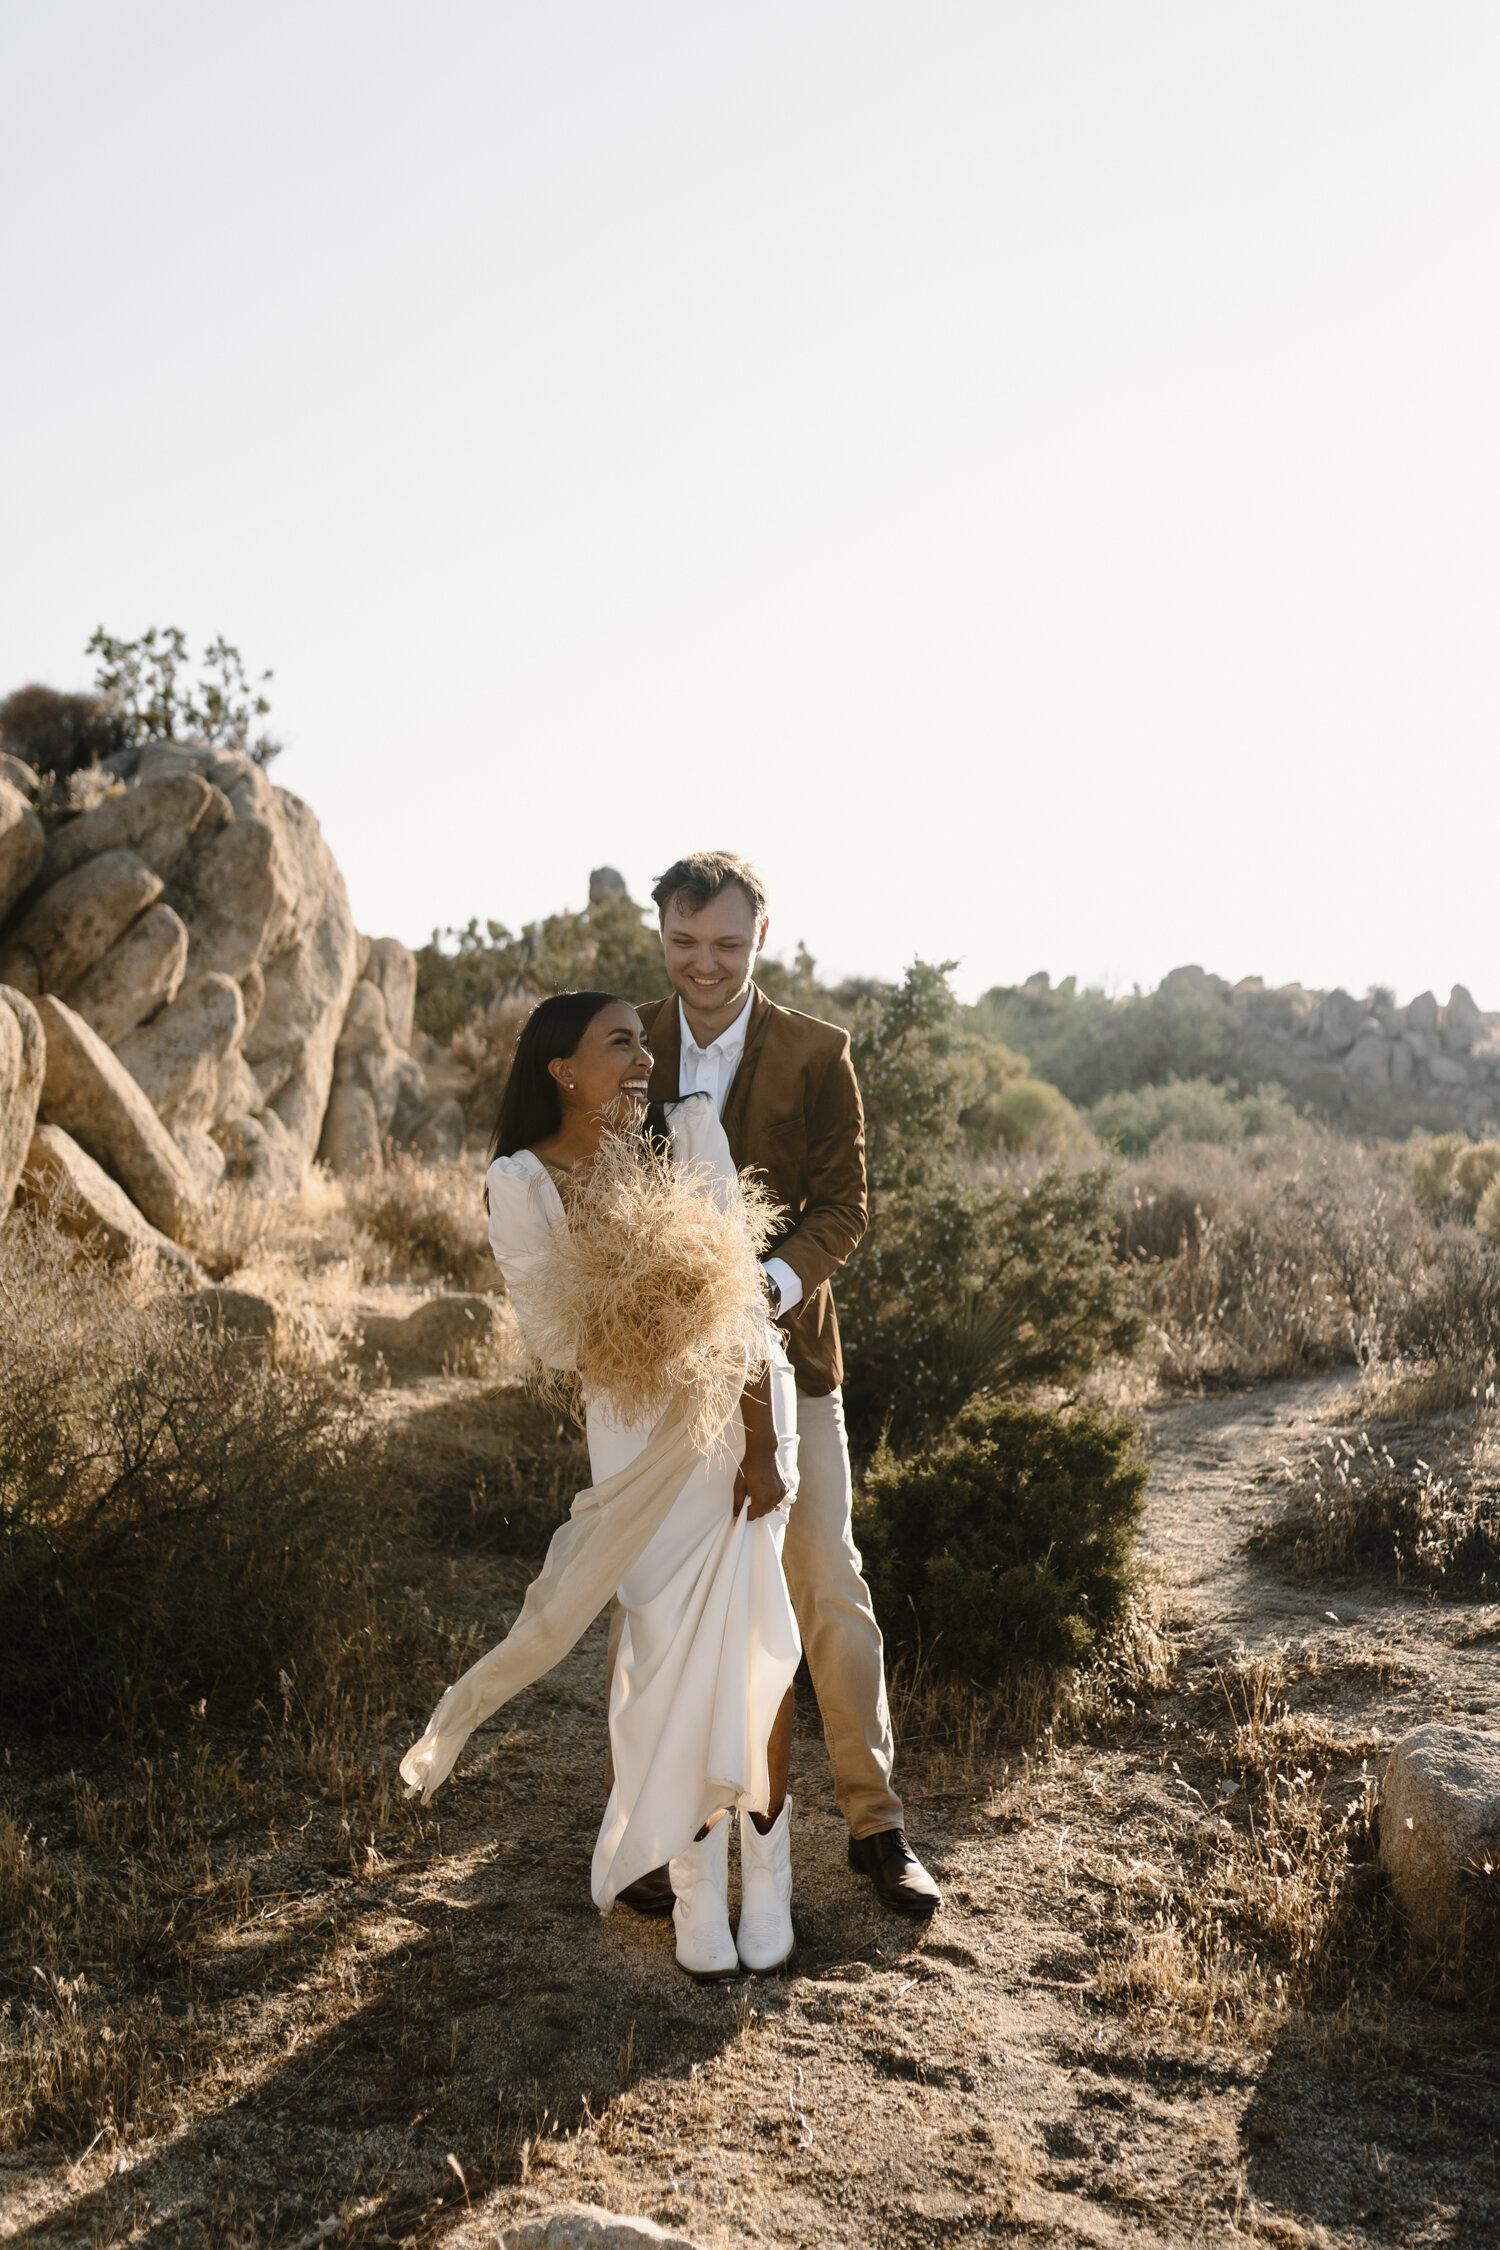 Playful bride and groom portraits by Kayli LaFon Photography